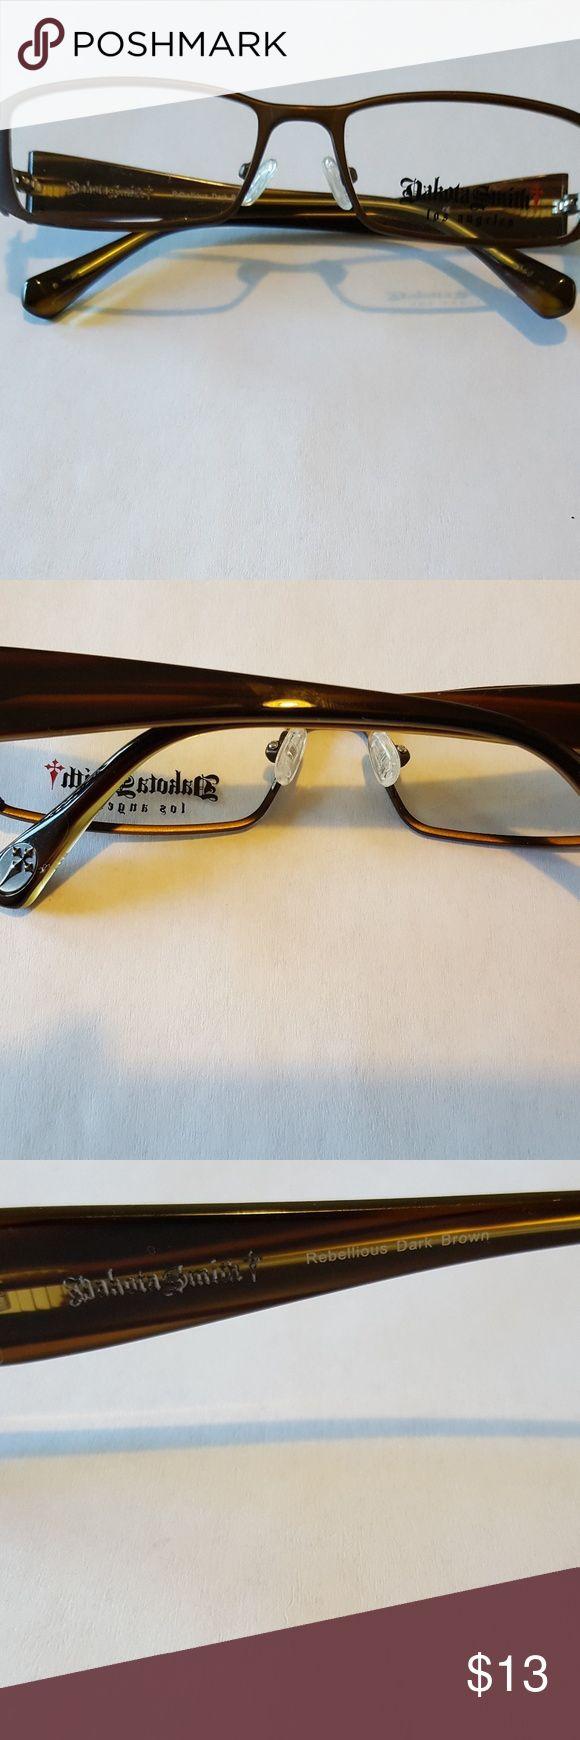 ❗LAST ONE❗Dakota Smith Glasses Nwot ... non prescription glasses. Comes with demo lens. You can have your own prescription put in them Accessories Glasses